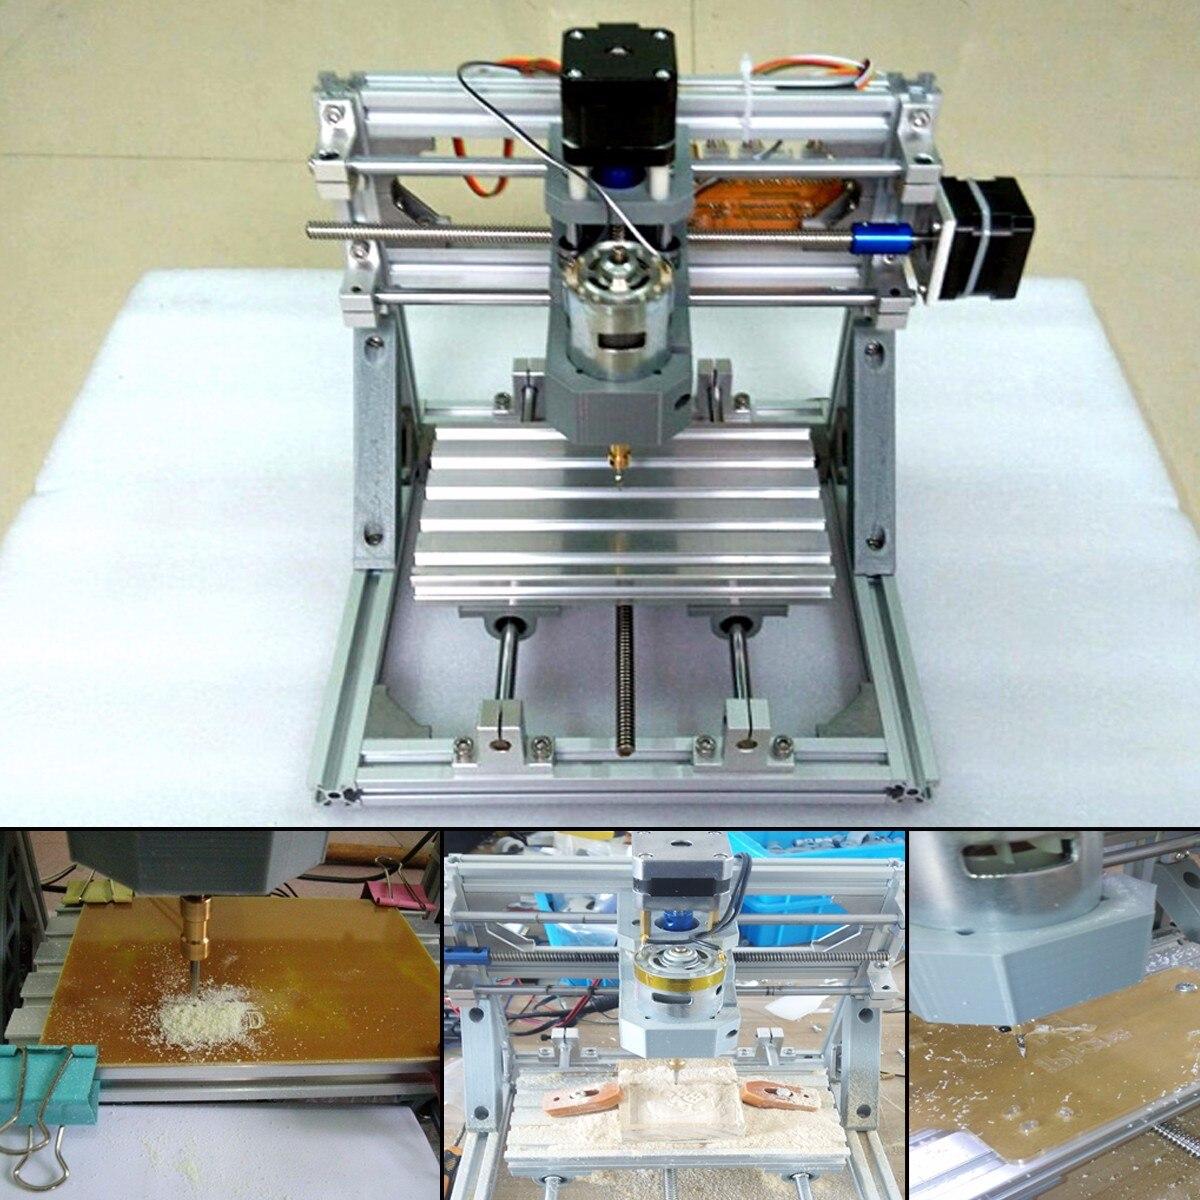 Mini 3 grabador láser máquina cc 12V DIY cortador de madera de escritorio/impresora/potencia ajustable con cabezal láser de 500MW - 2